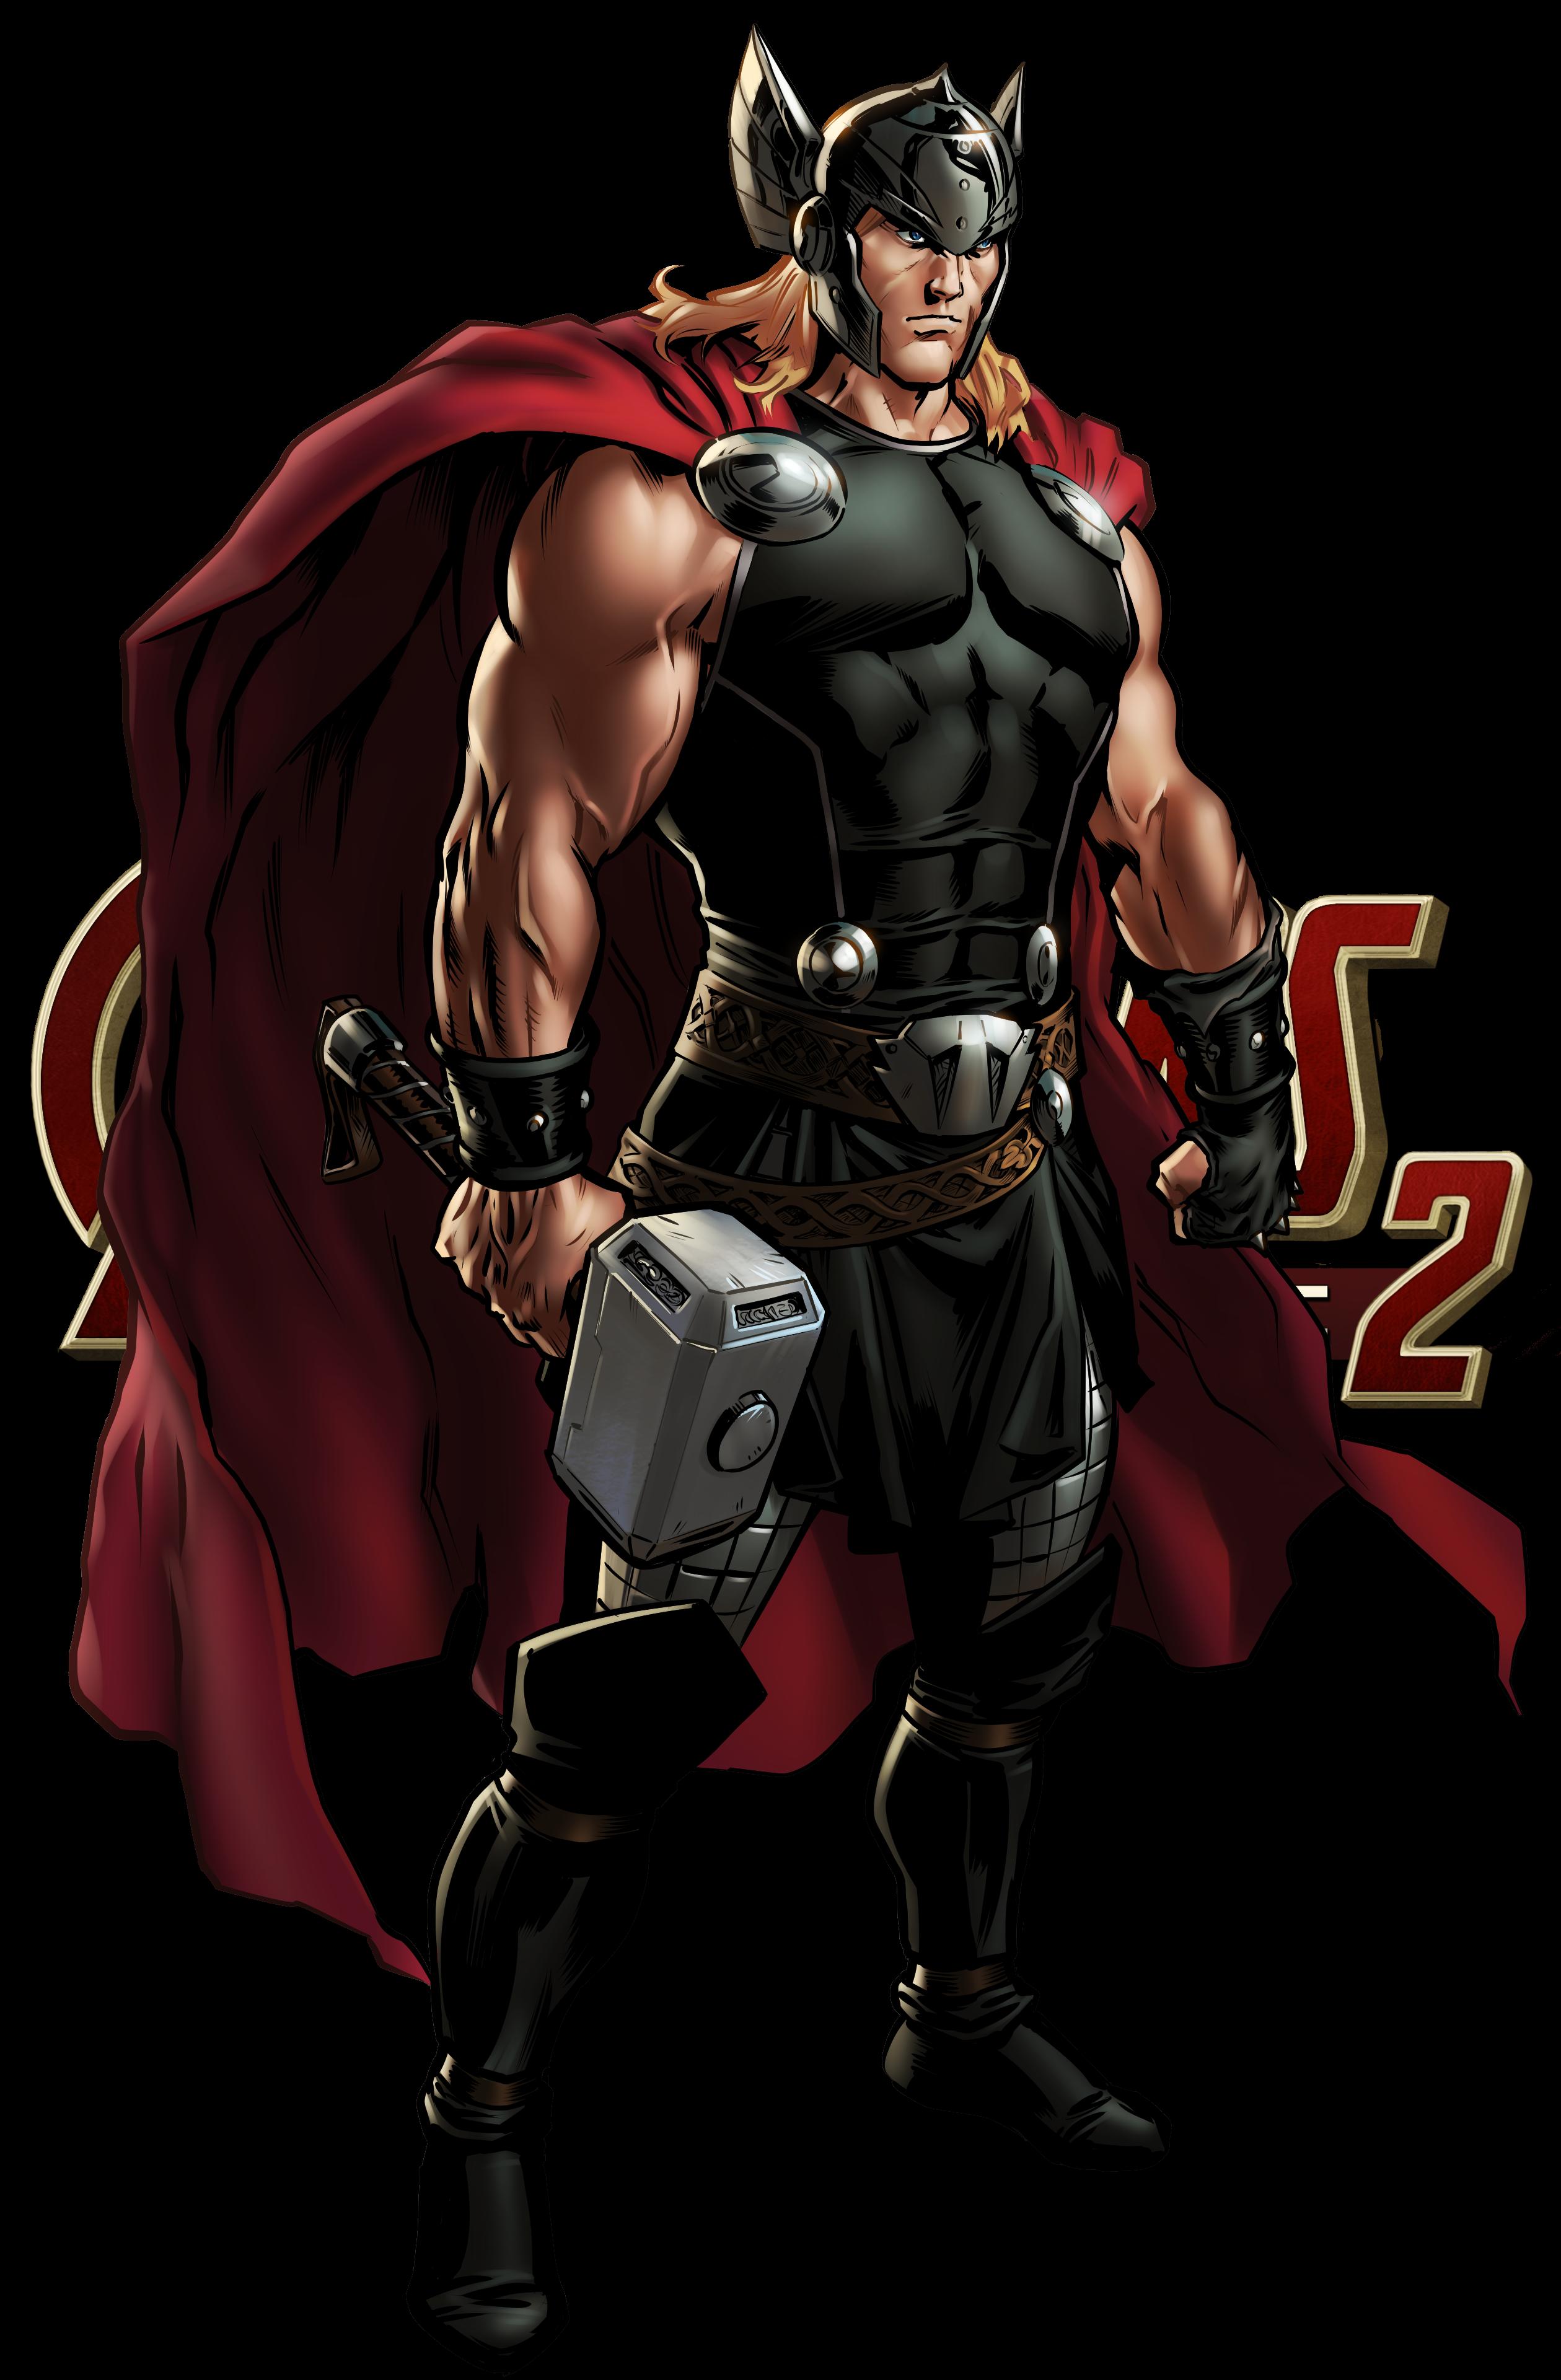 Maa2 Thor01 01 Logo Png 2519 3841 Superheroes Marvel Personajes De Marvel Heroes Marvel